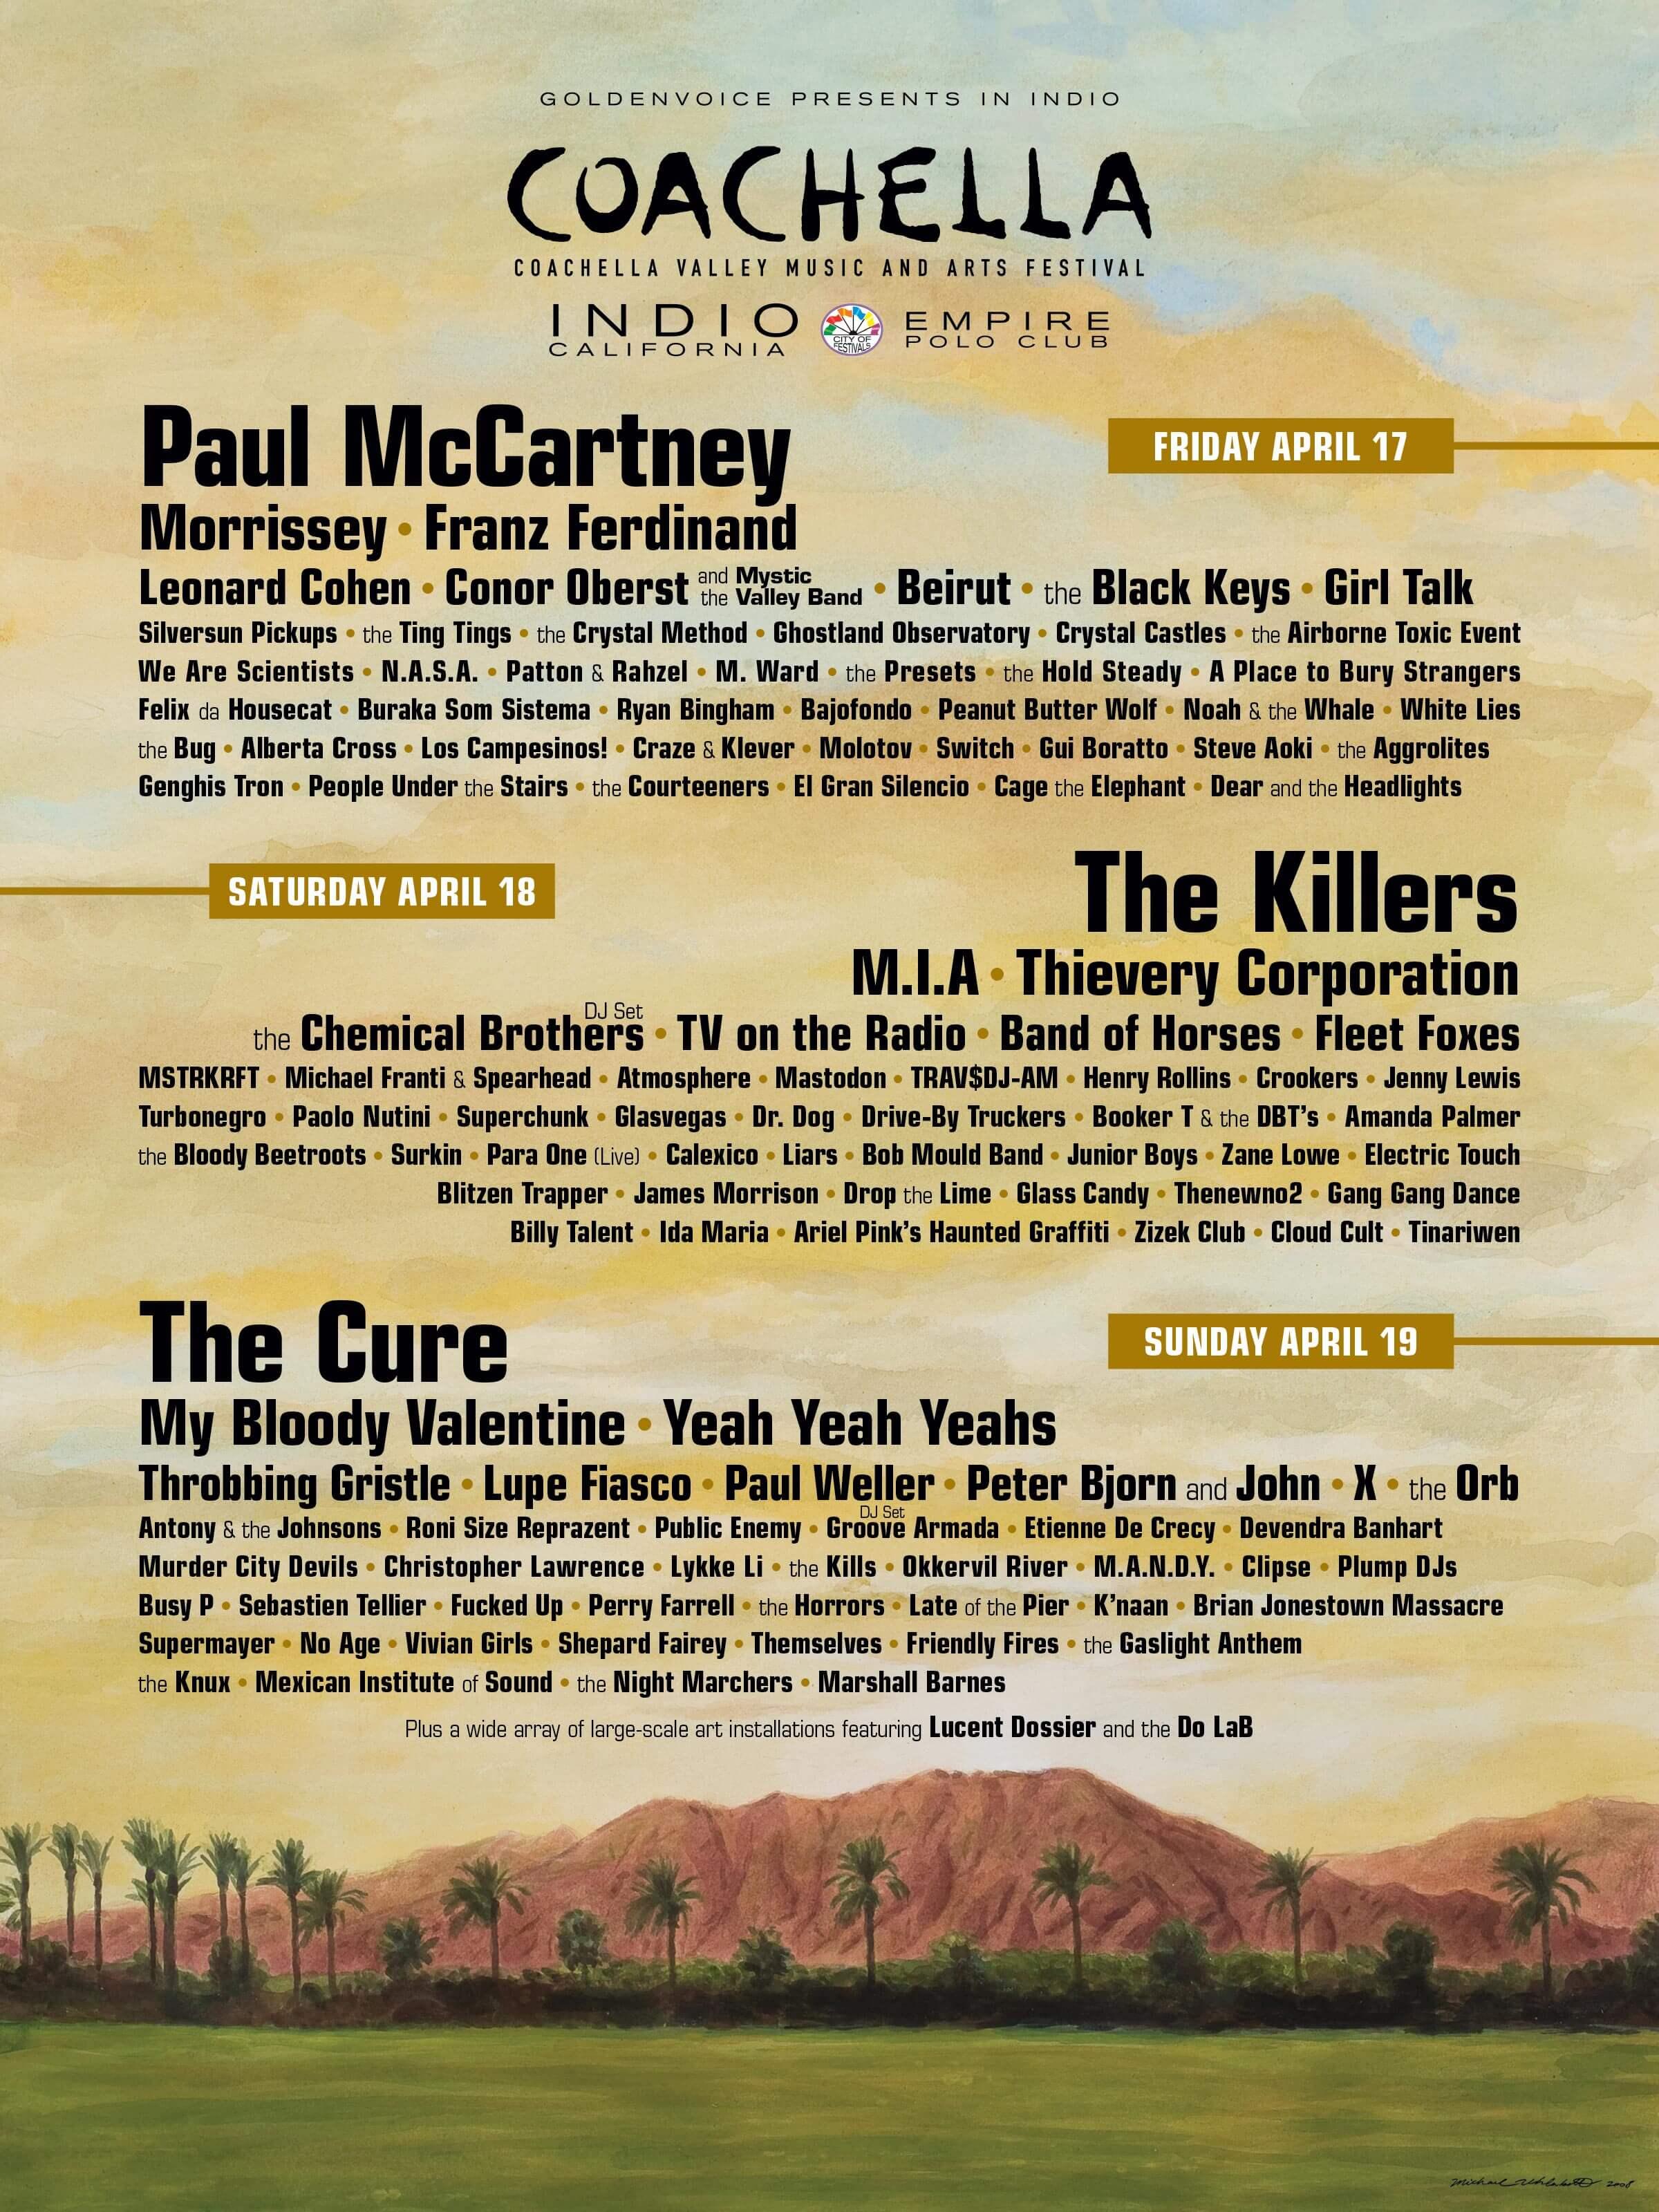 Coachella 2009 Lineup Poster